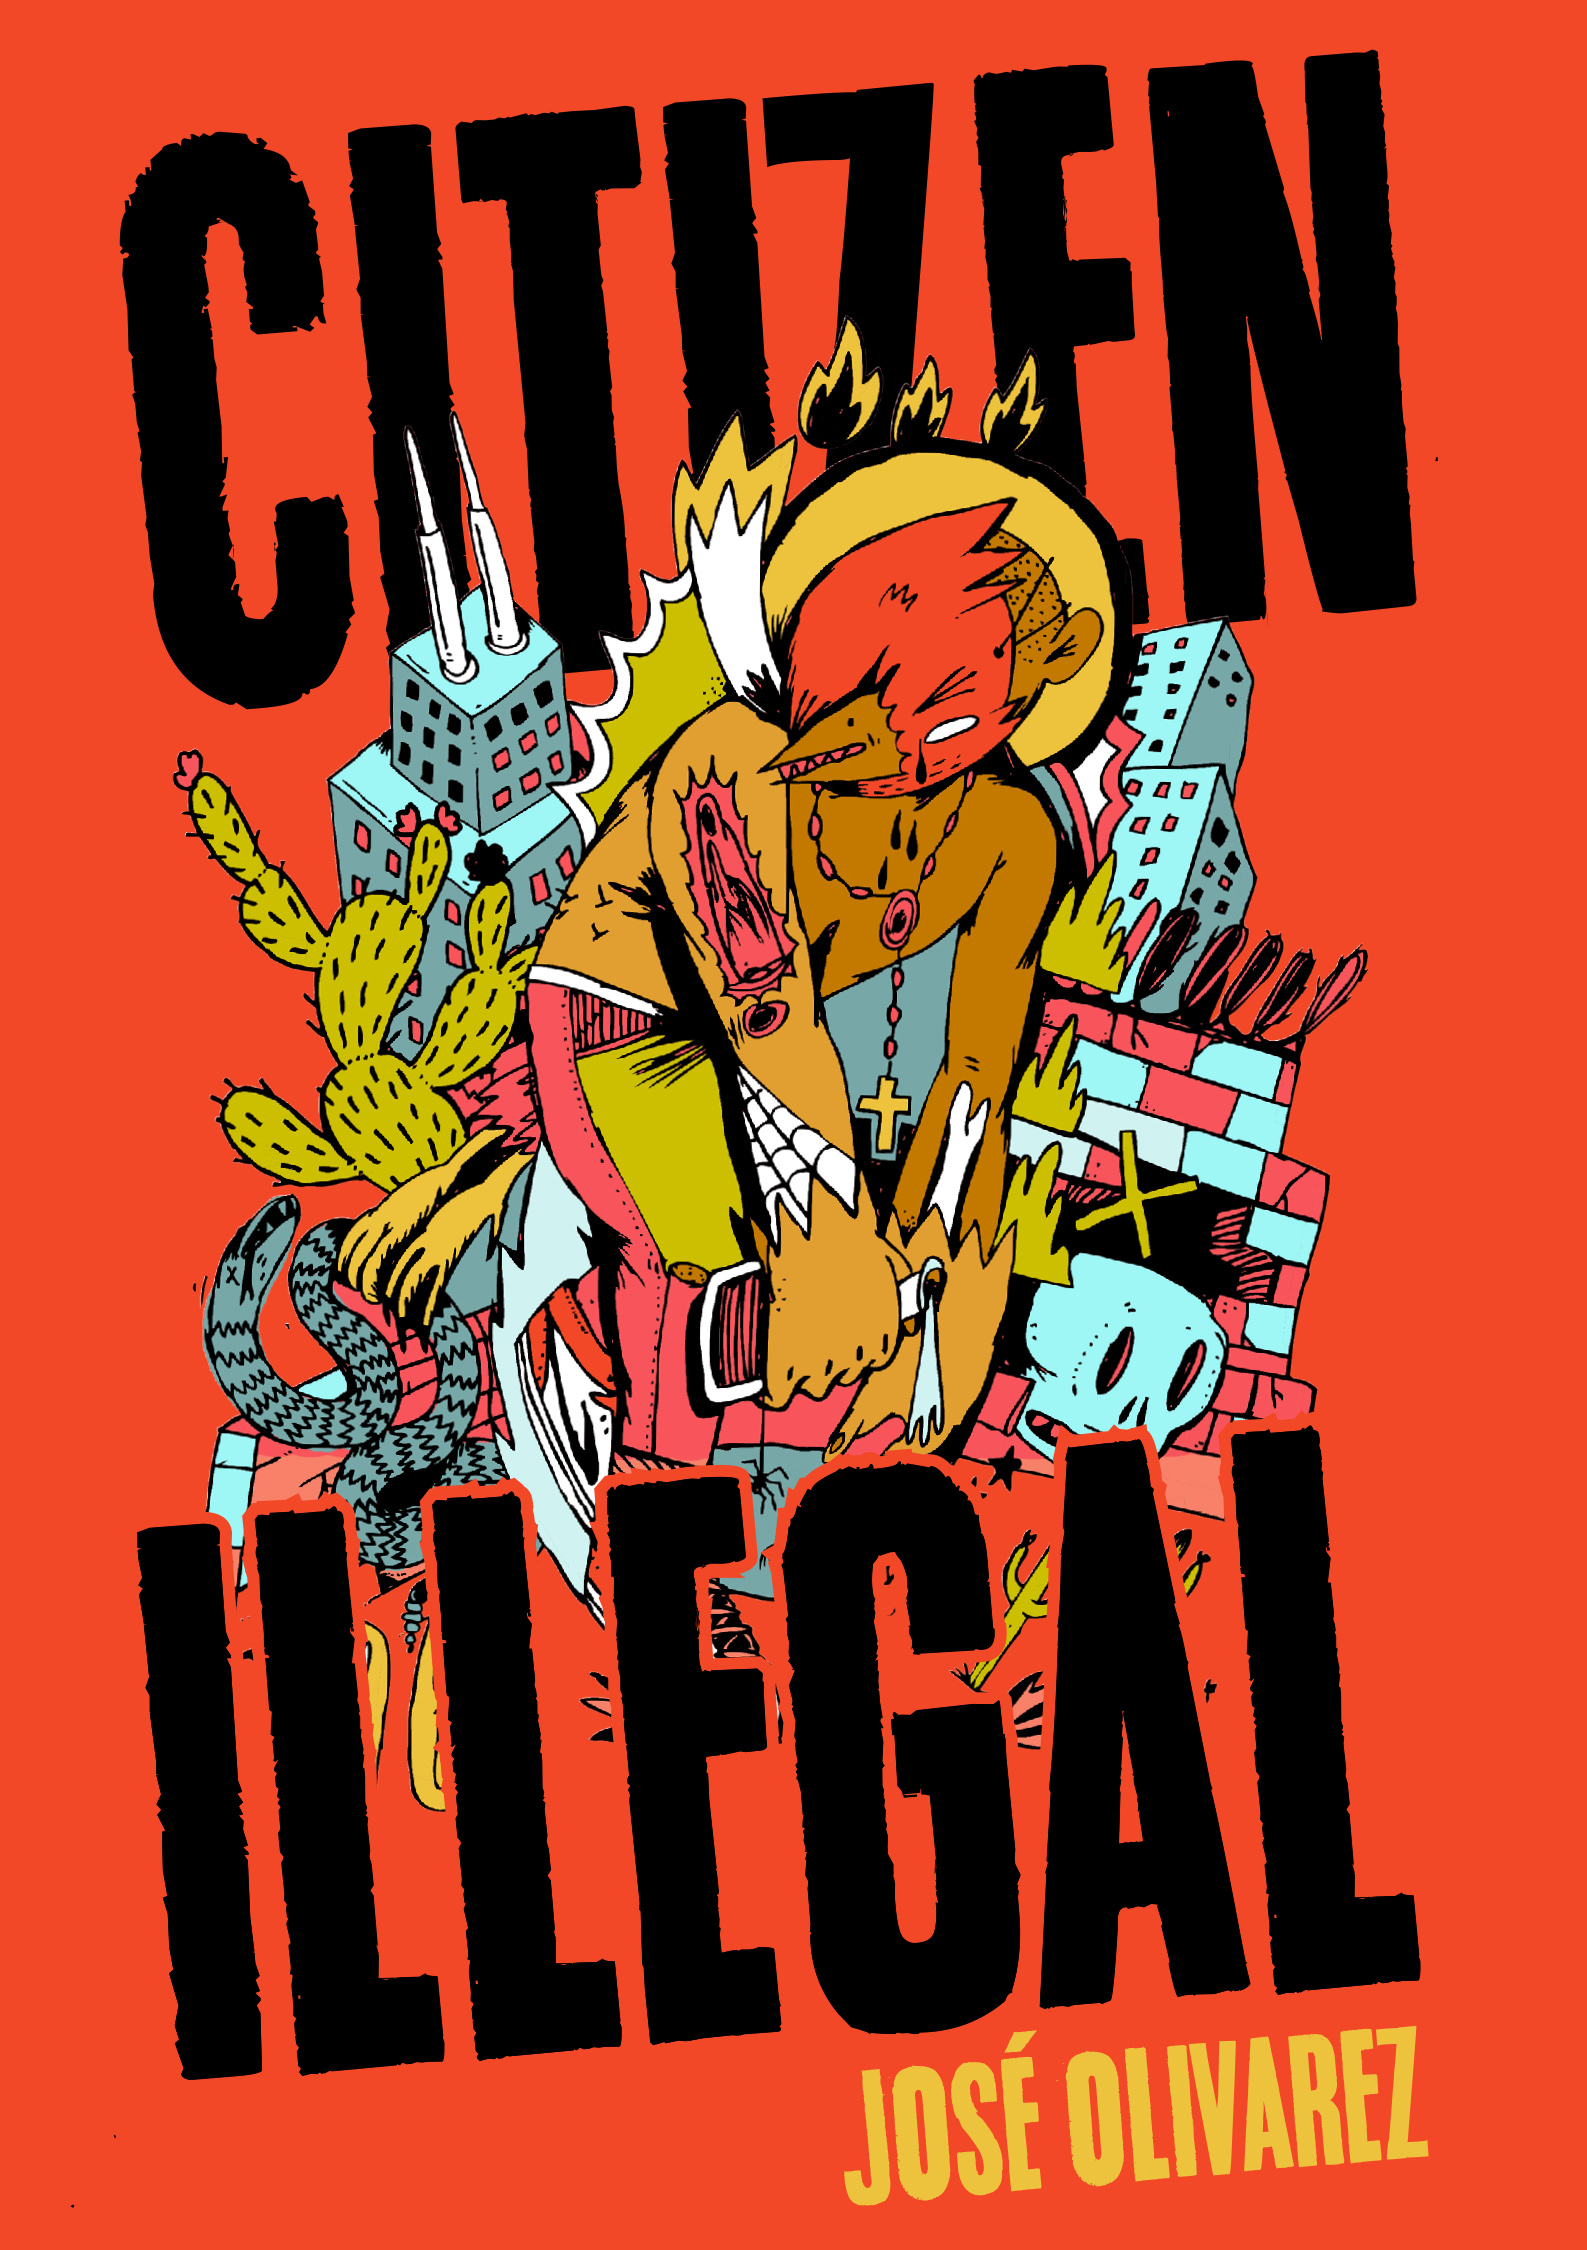 Citizen_Illegal-Cover (1) - José Olivarez.jpg